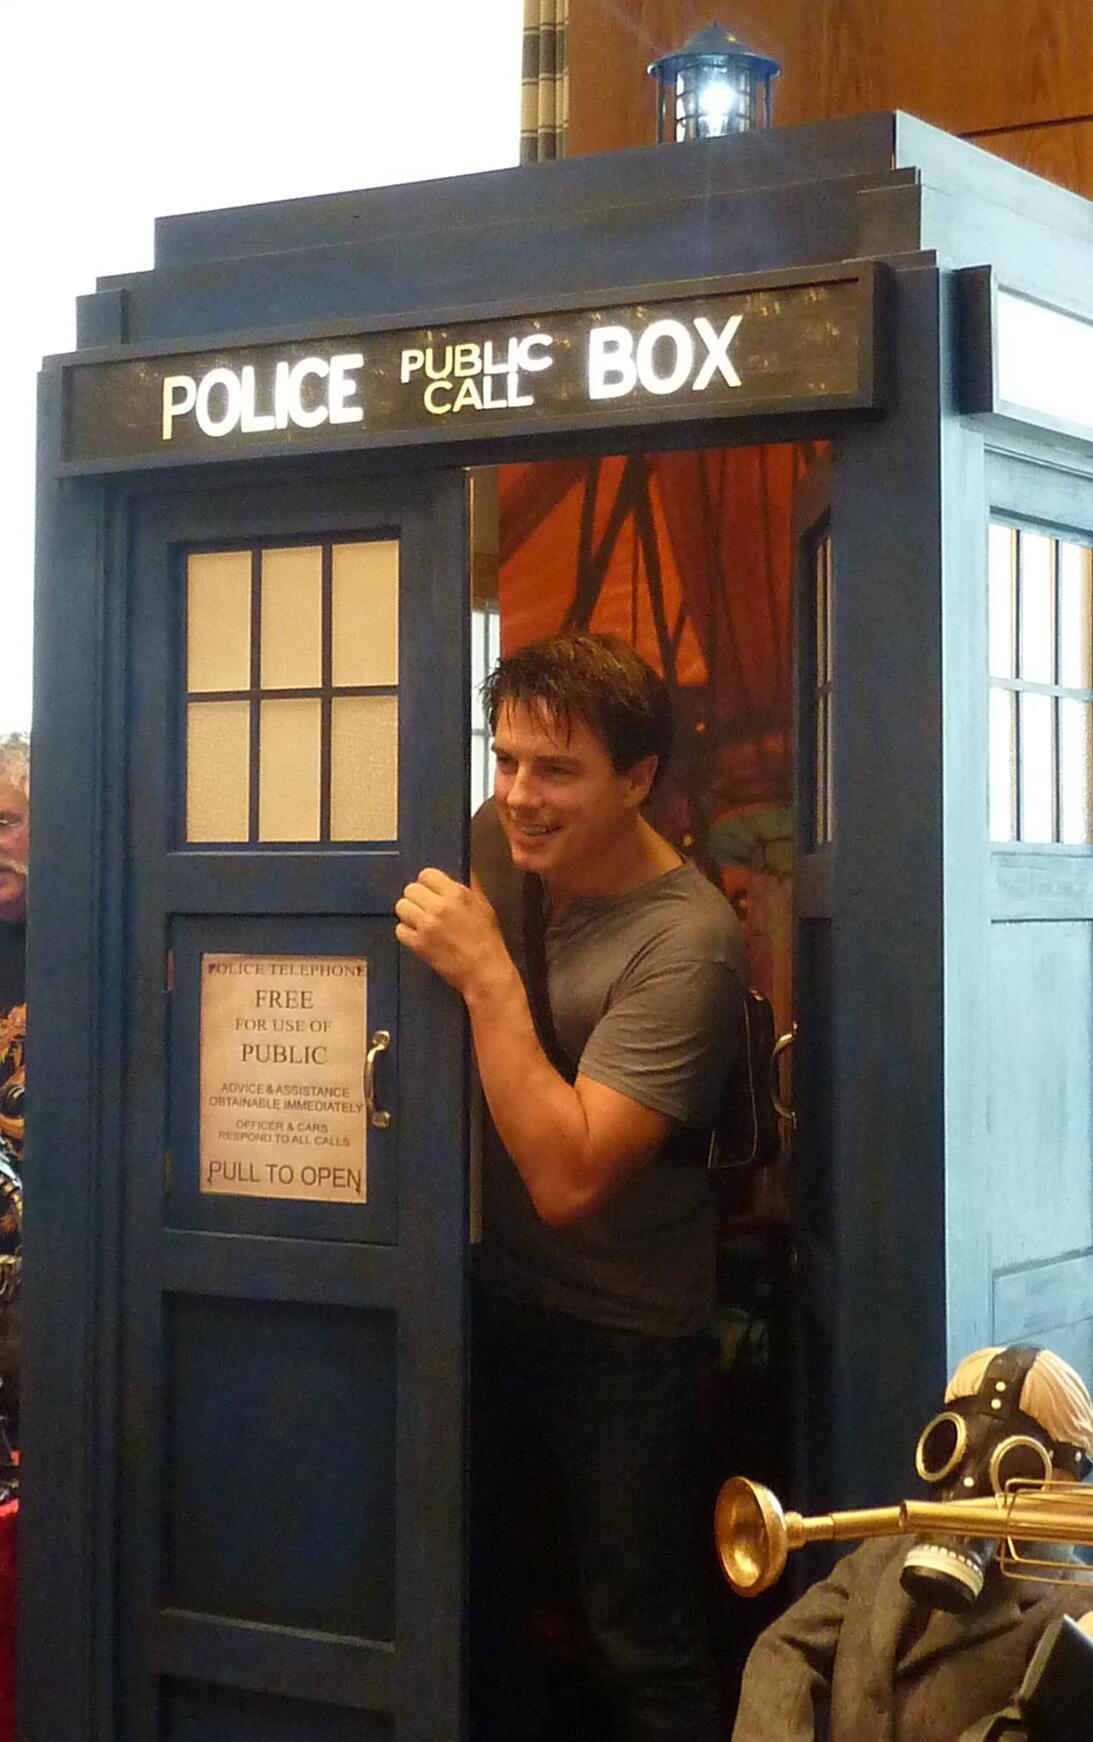 RT @CaptainsCariad: JB in the TARDIS :D Bring back Captain Jack! #FedCon http://t.co/JjHGL09B3i